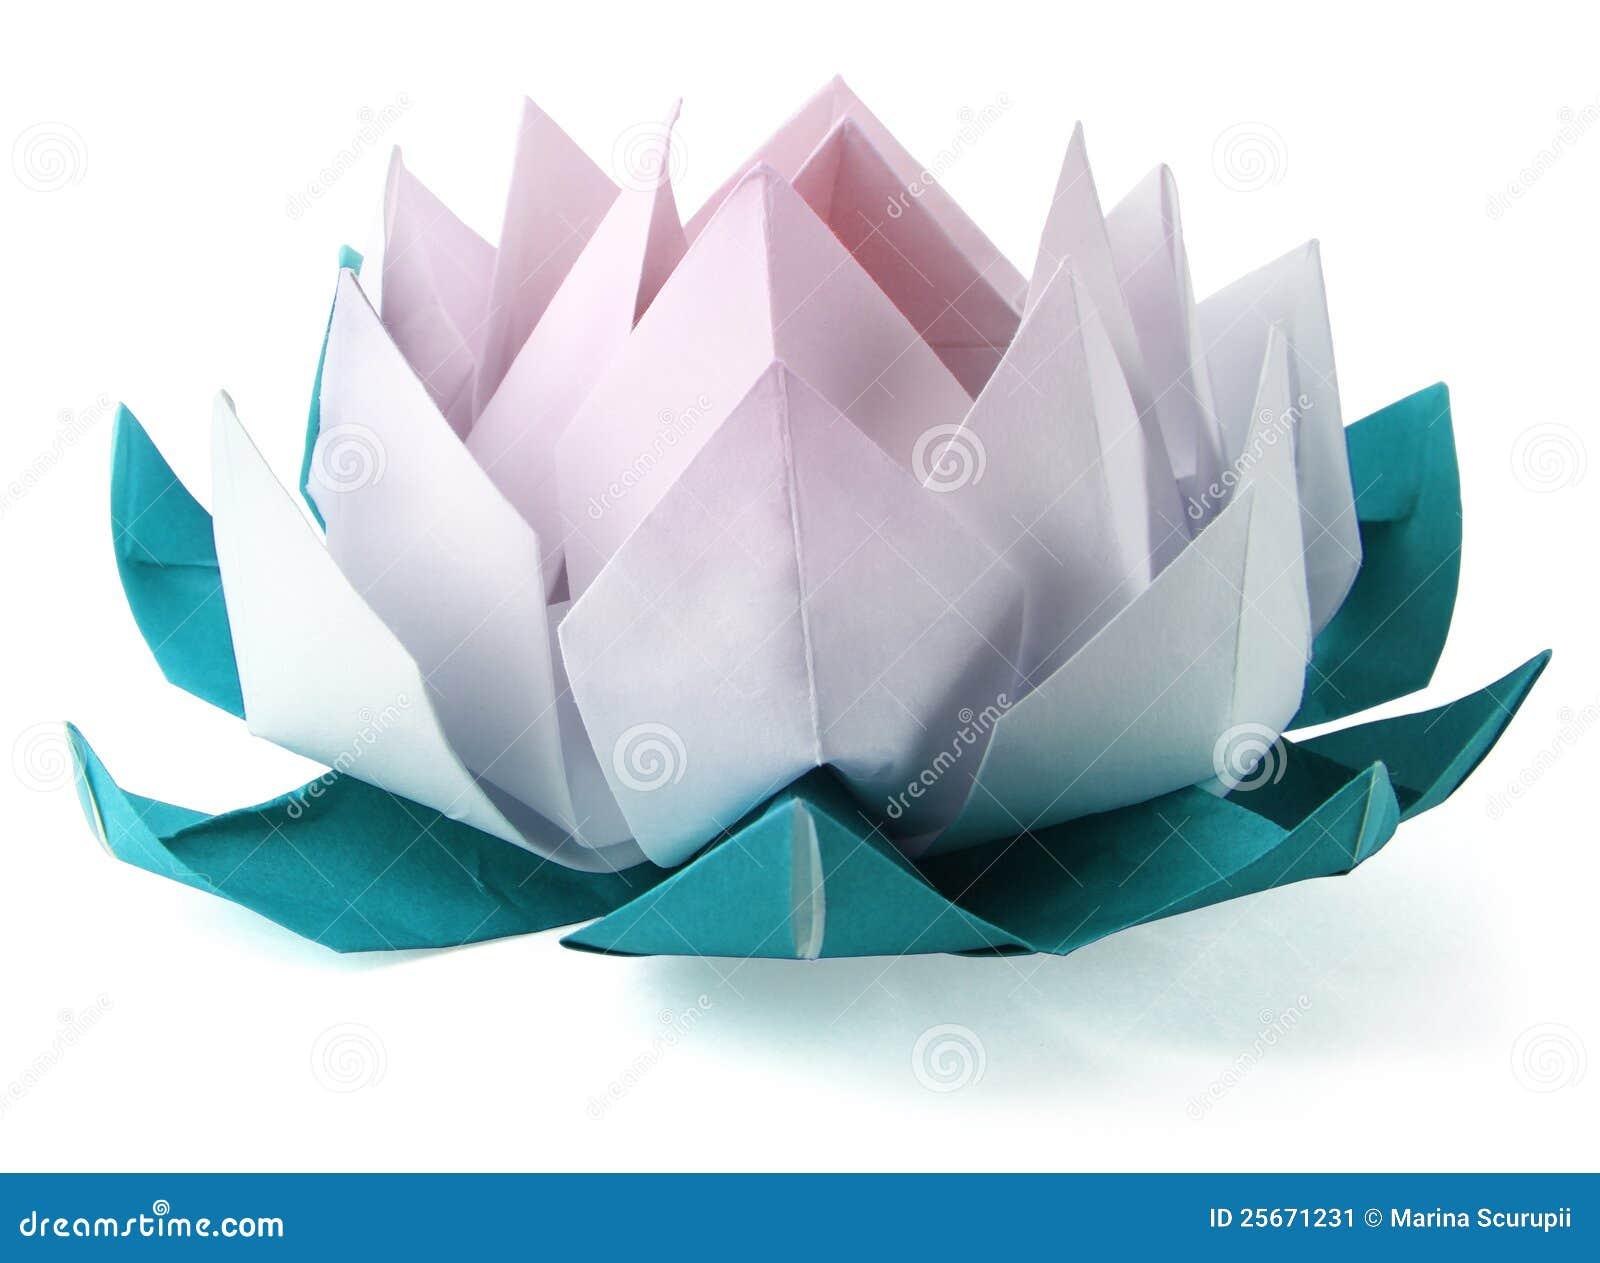 Origami Lotus Stock Image   Image  25671231 e0hUhuyn